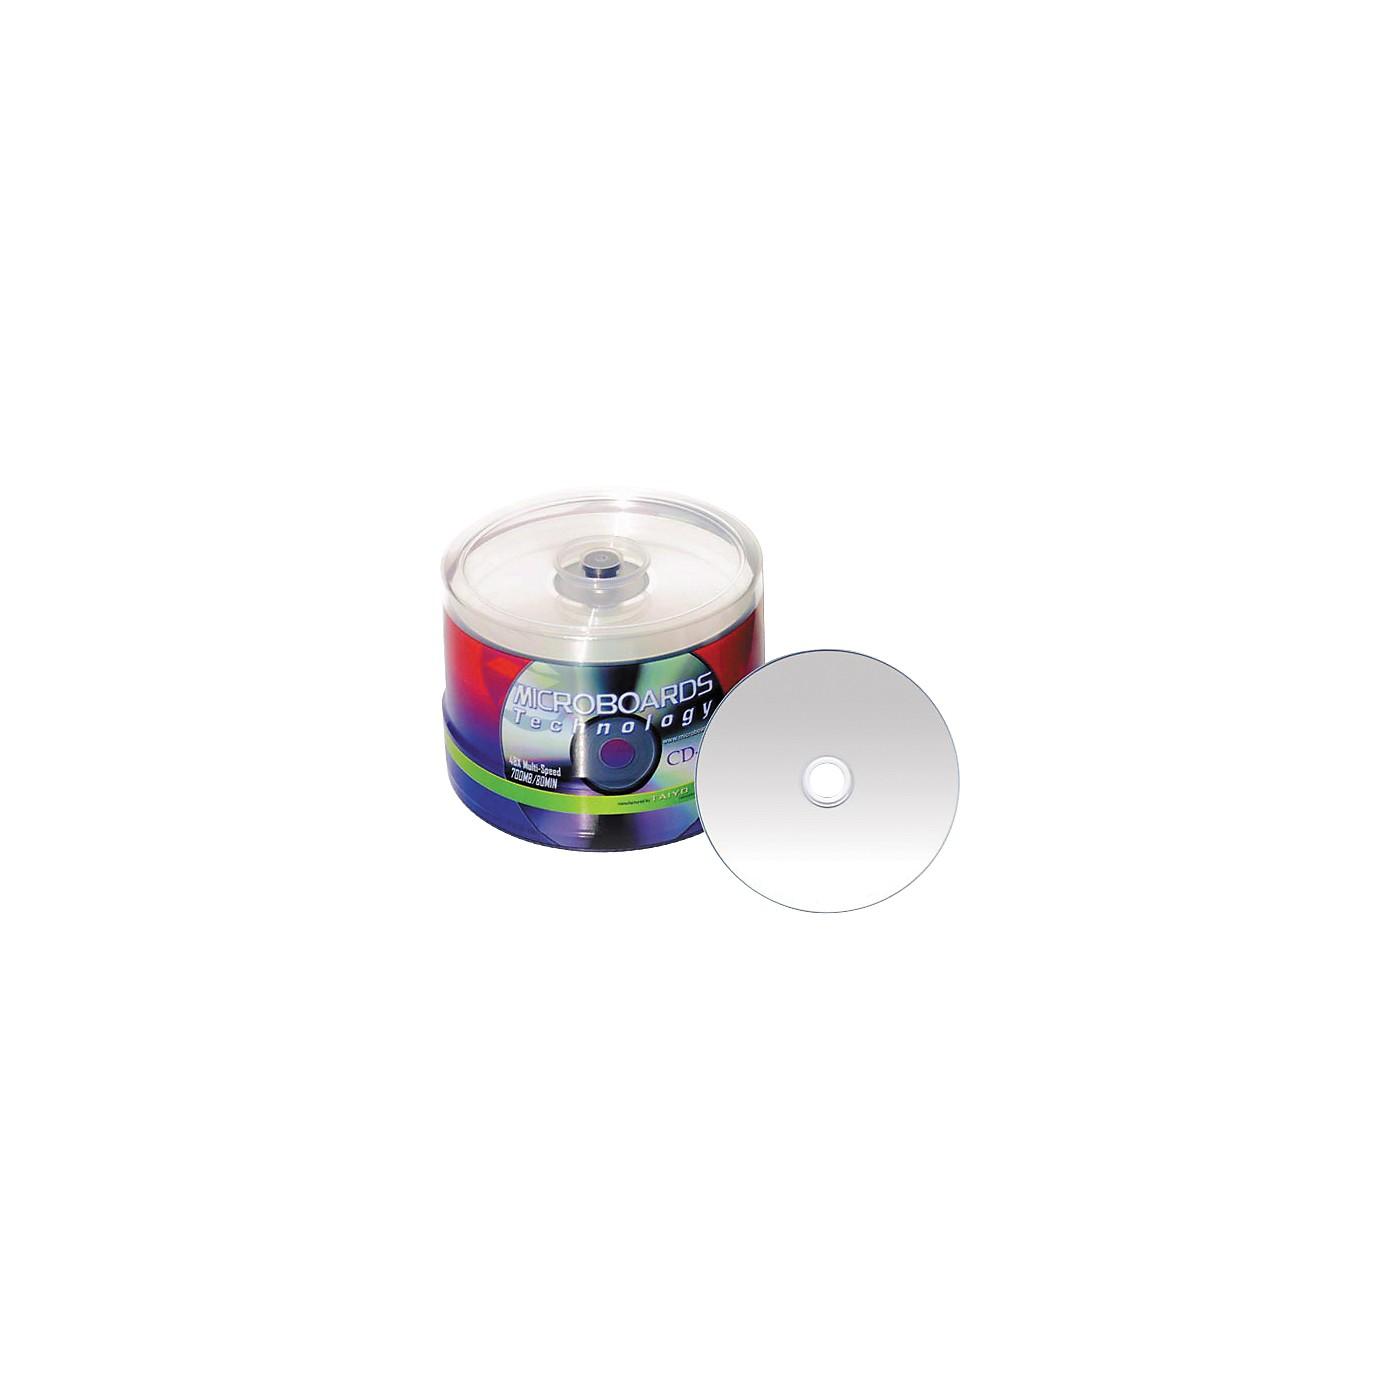 Taiyo Yuden 80 Minute/700 MB CD-R, 52X Silver Inkjet Hub Printable, 100 Disc Spindle thumbnail